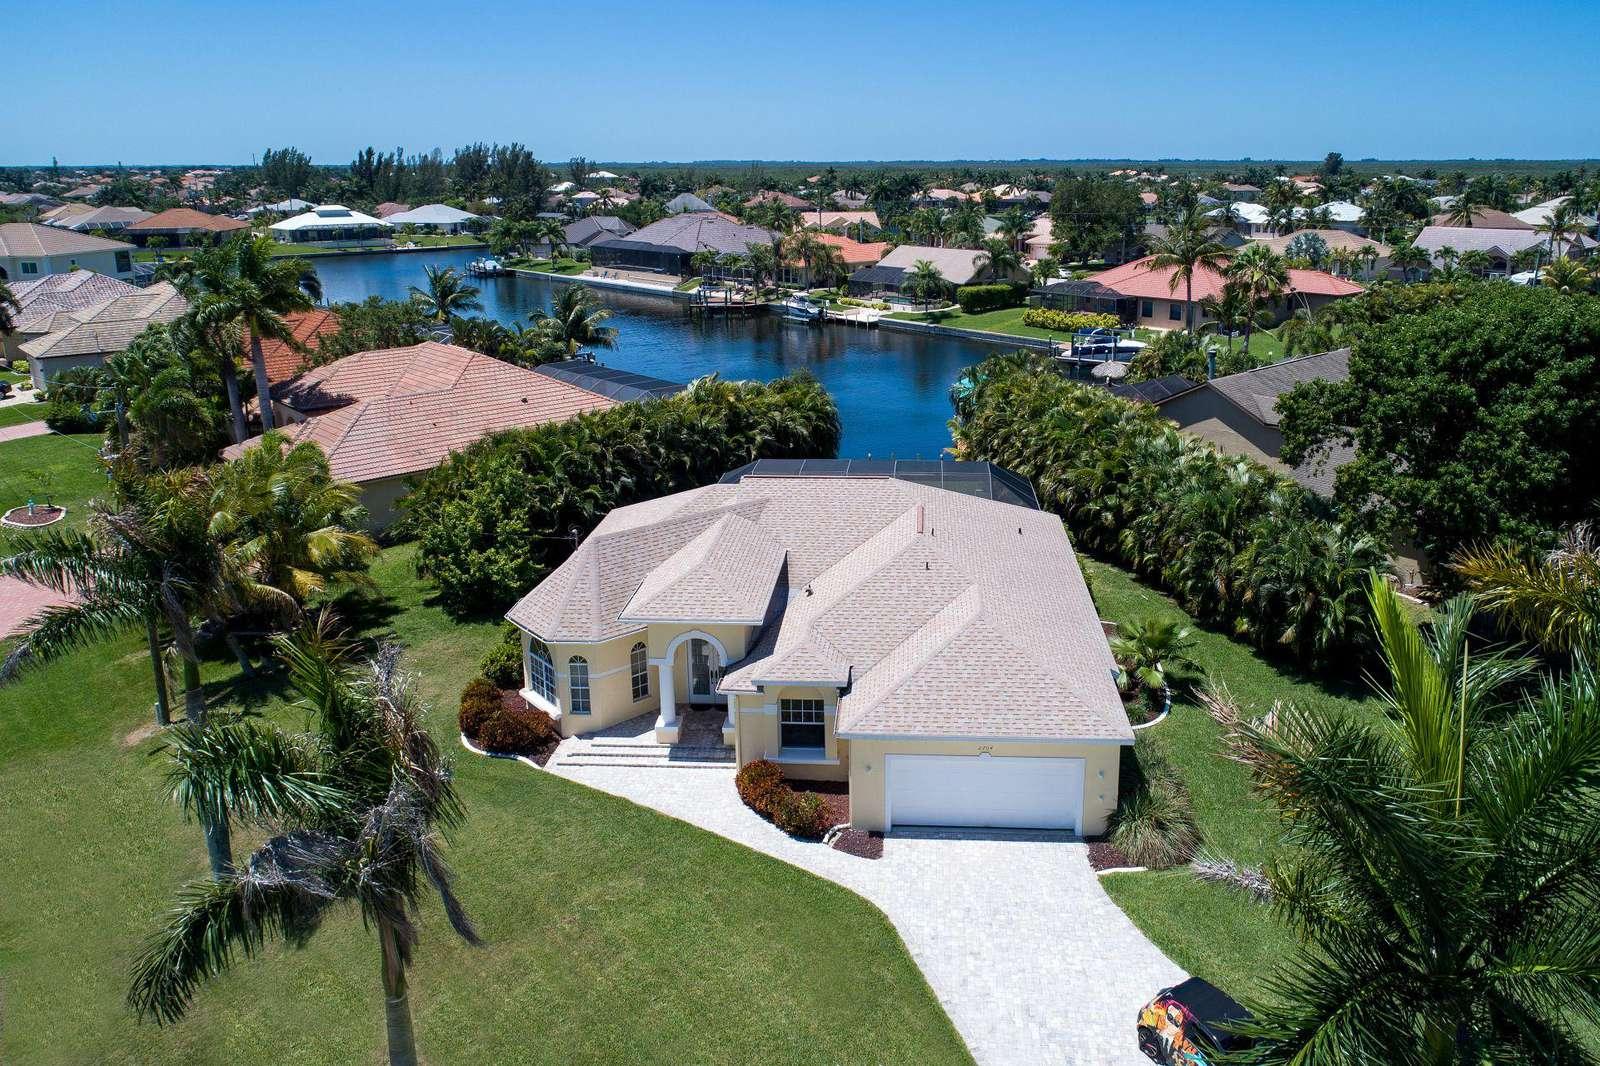 Wischis Florida Home - Cape Coral Ferienhaus - Treasure Island - Hausverwaltung - Immobilien